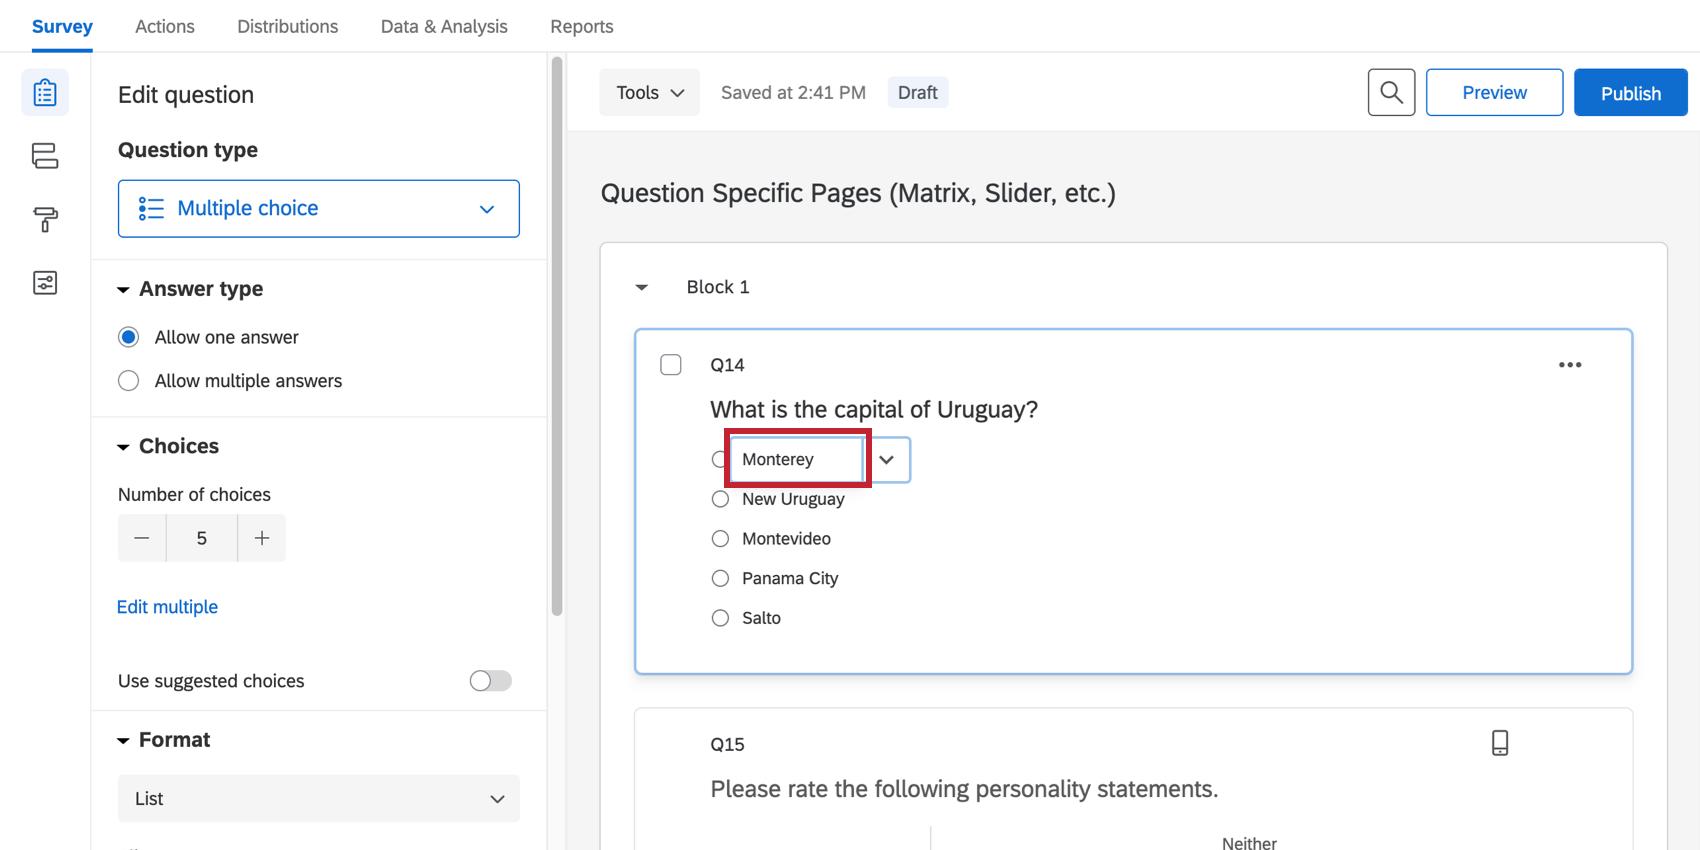 Editing an answer choice